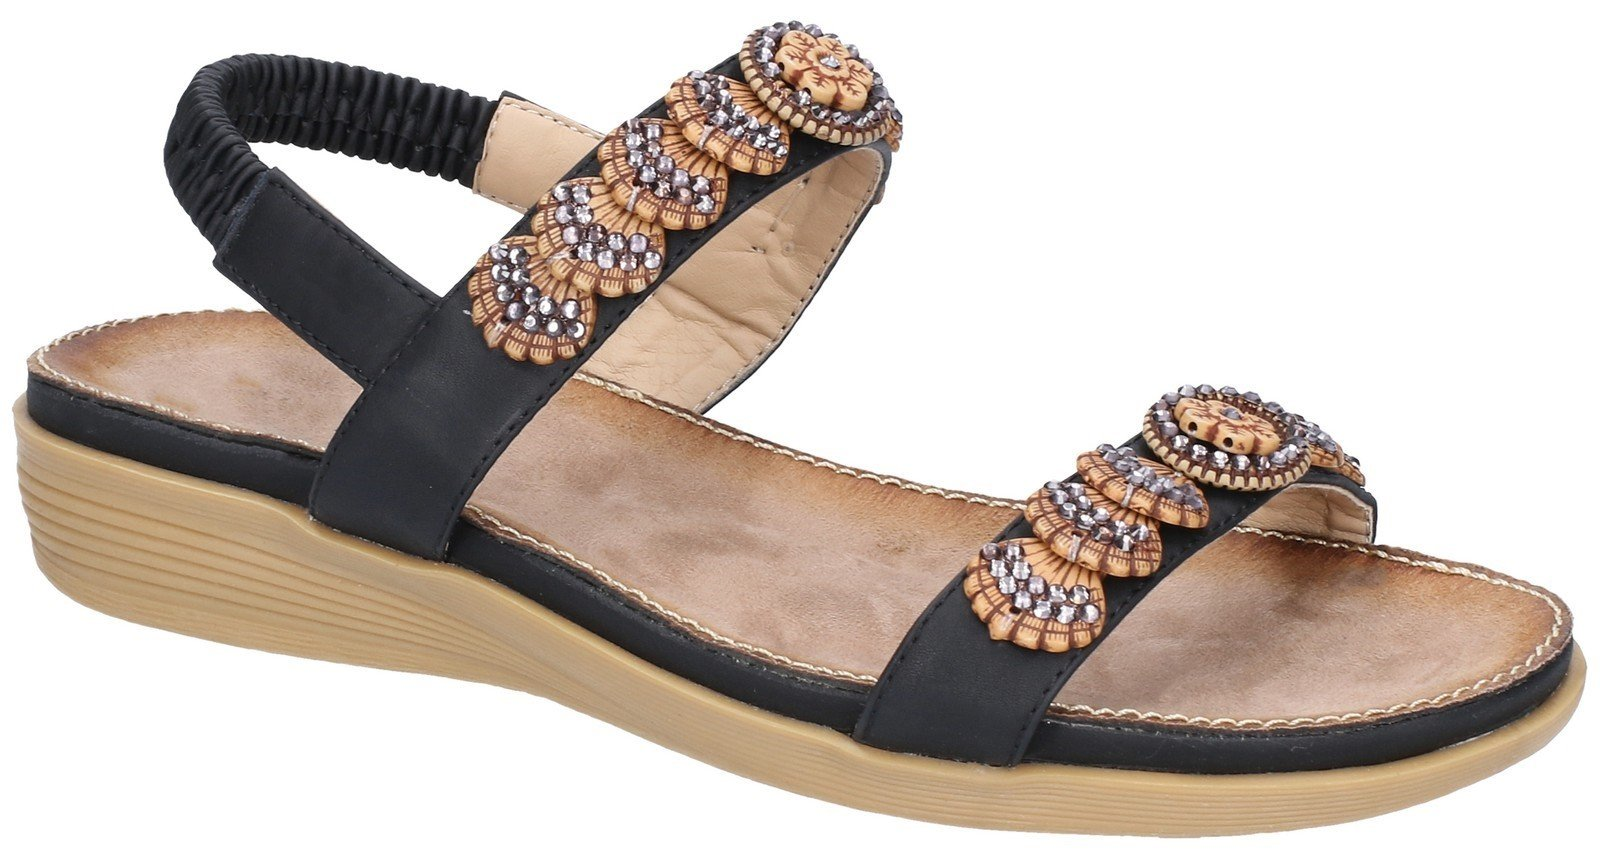 Fleet & Foster Women's Java Elasticated Sandal Various Colours 28280 - Black 3